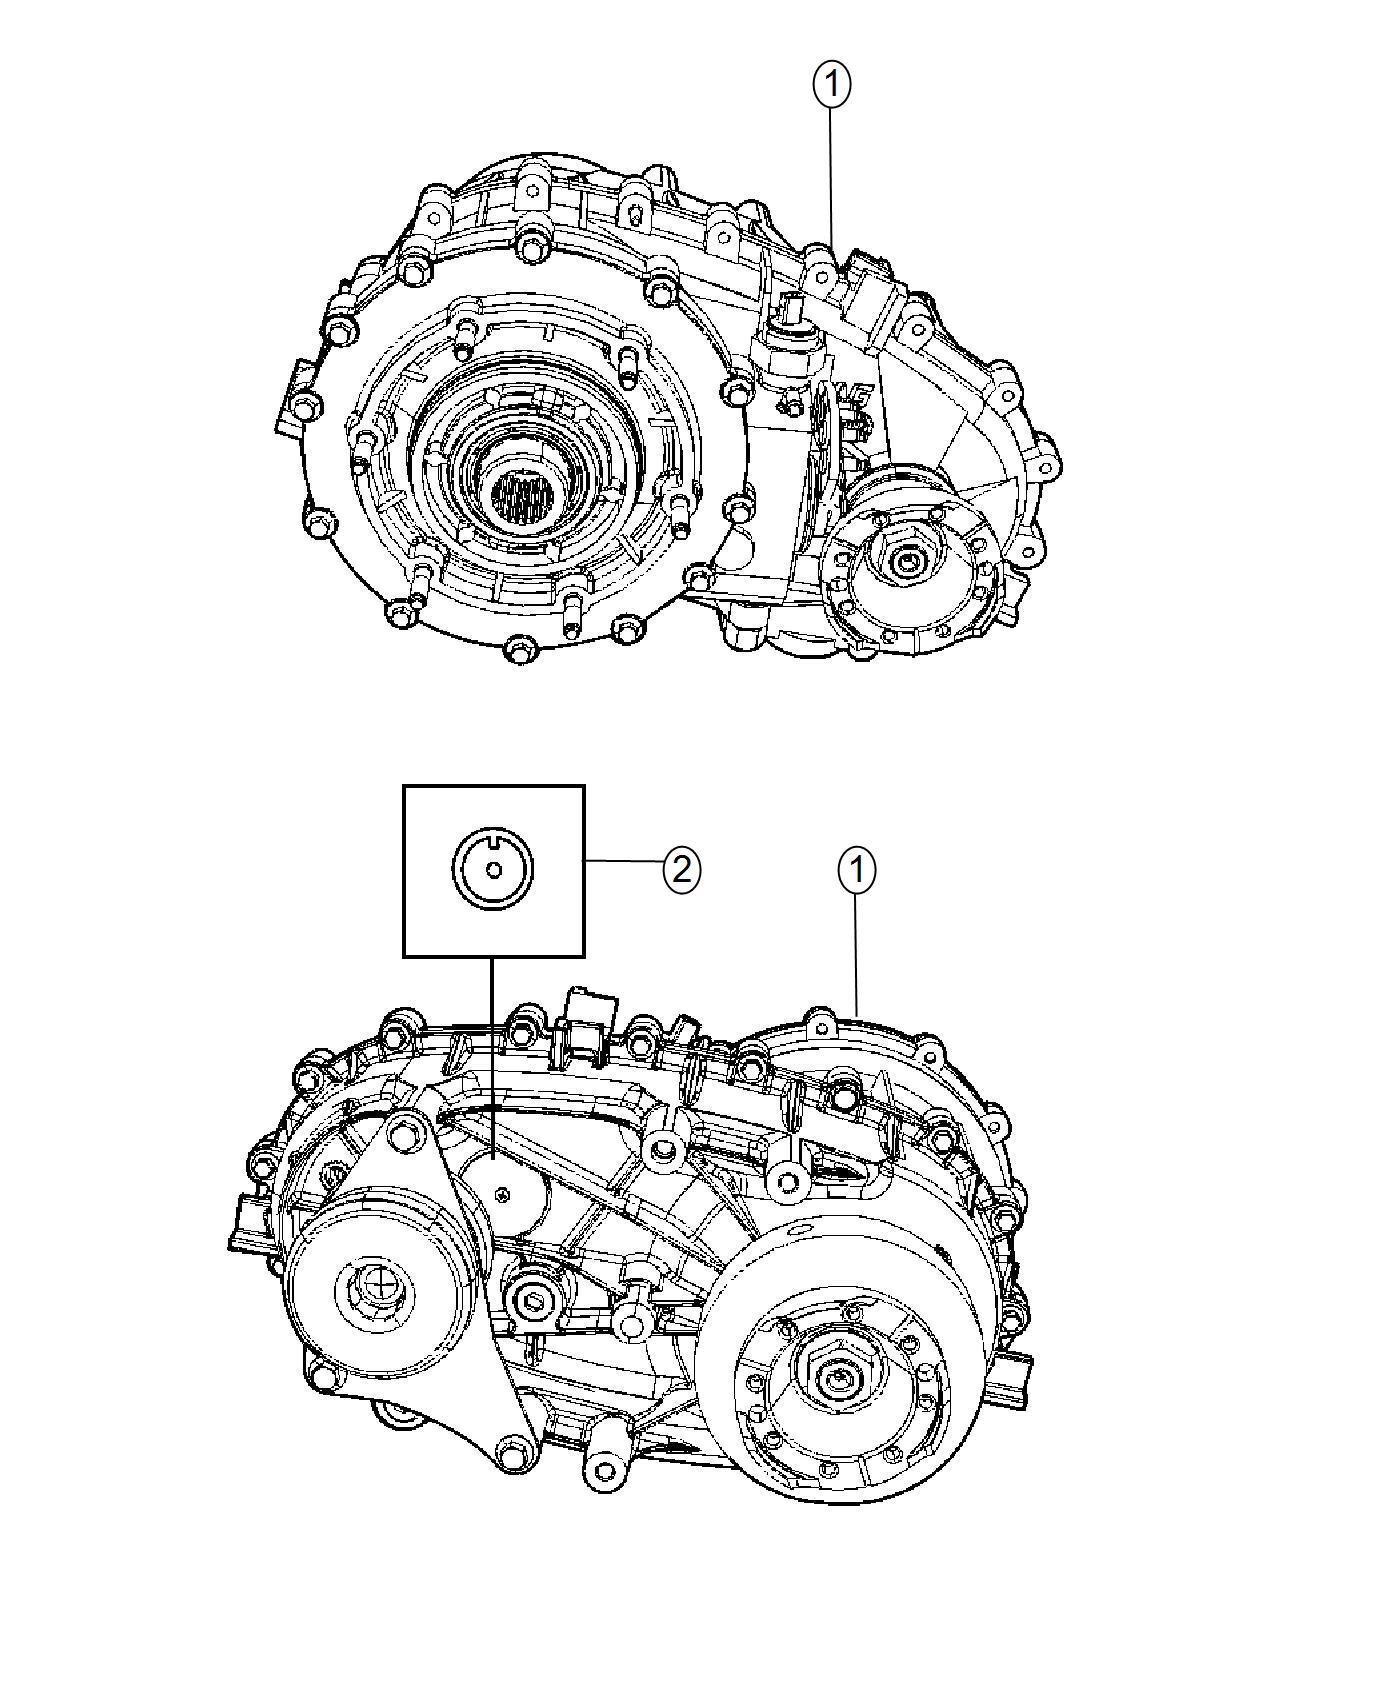 Jeep Wrangler Sleeve. Shift range. Rental, marketing, dhw